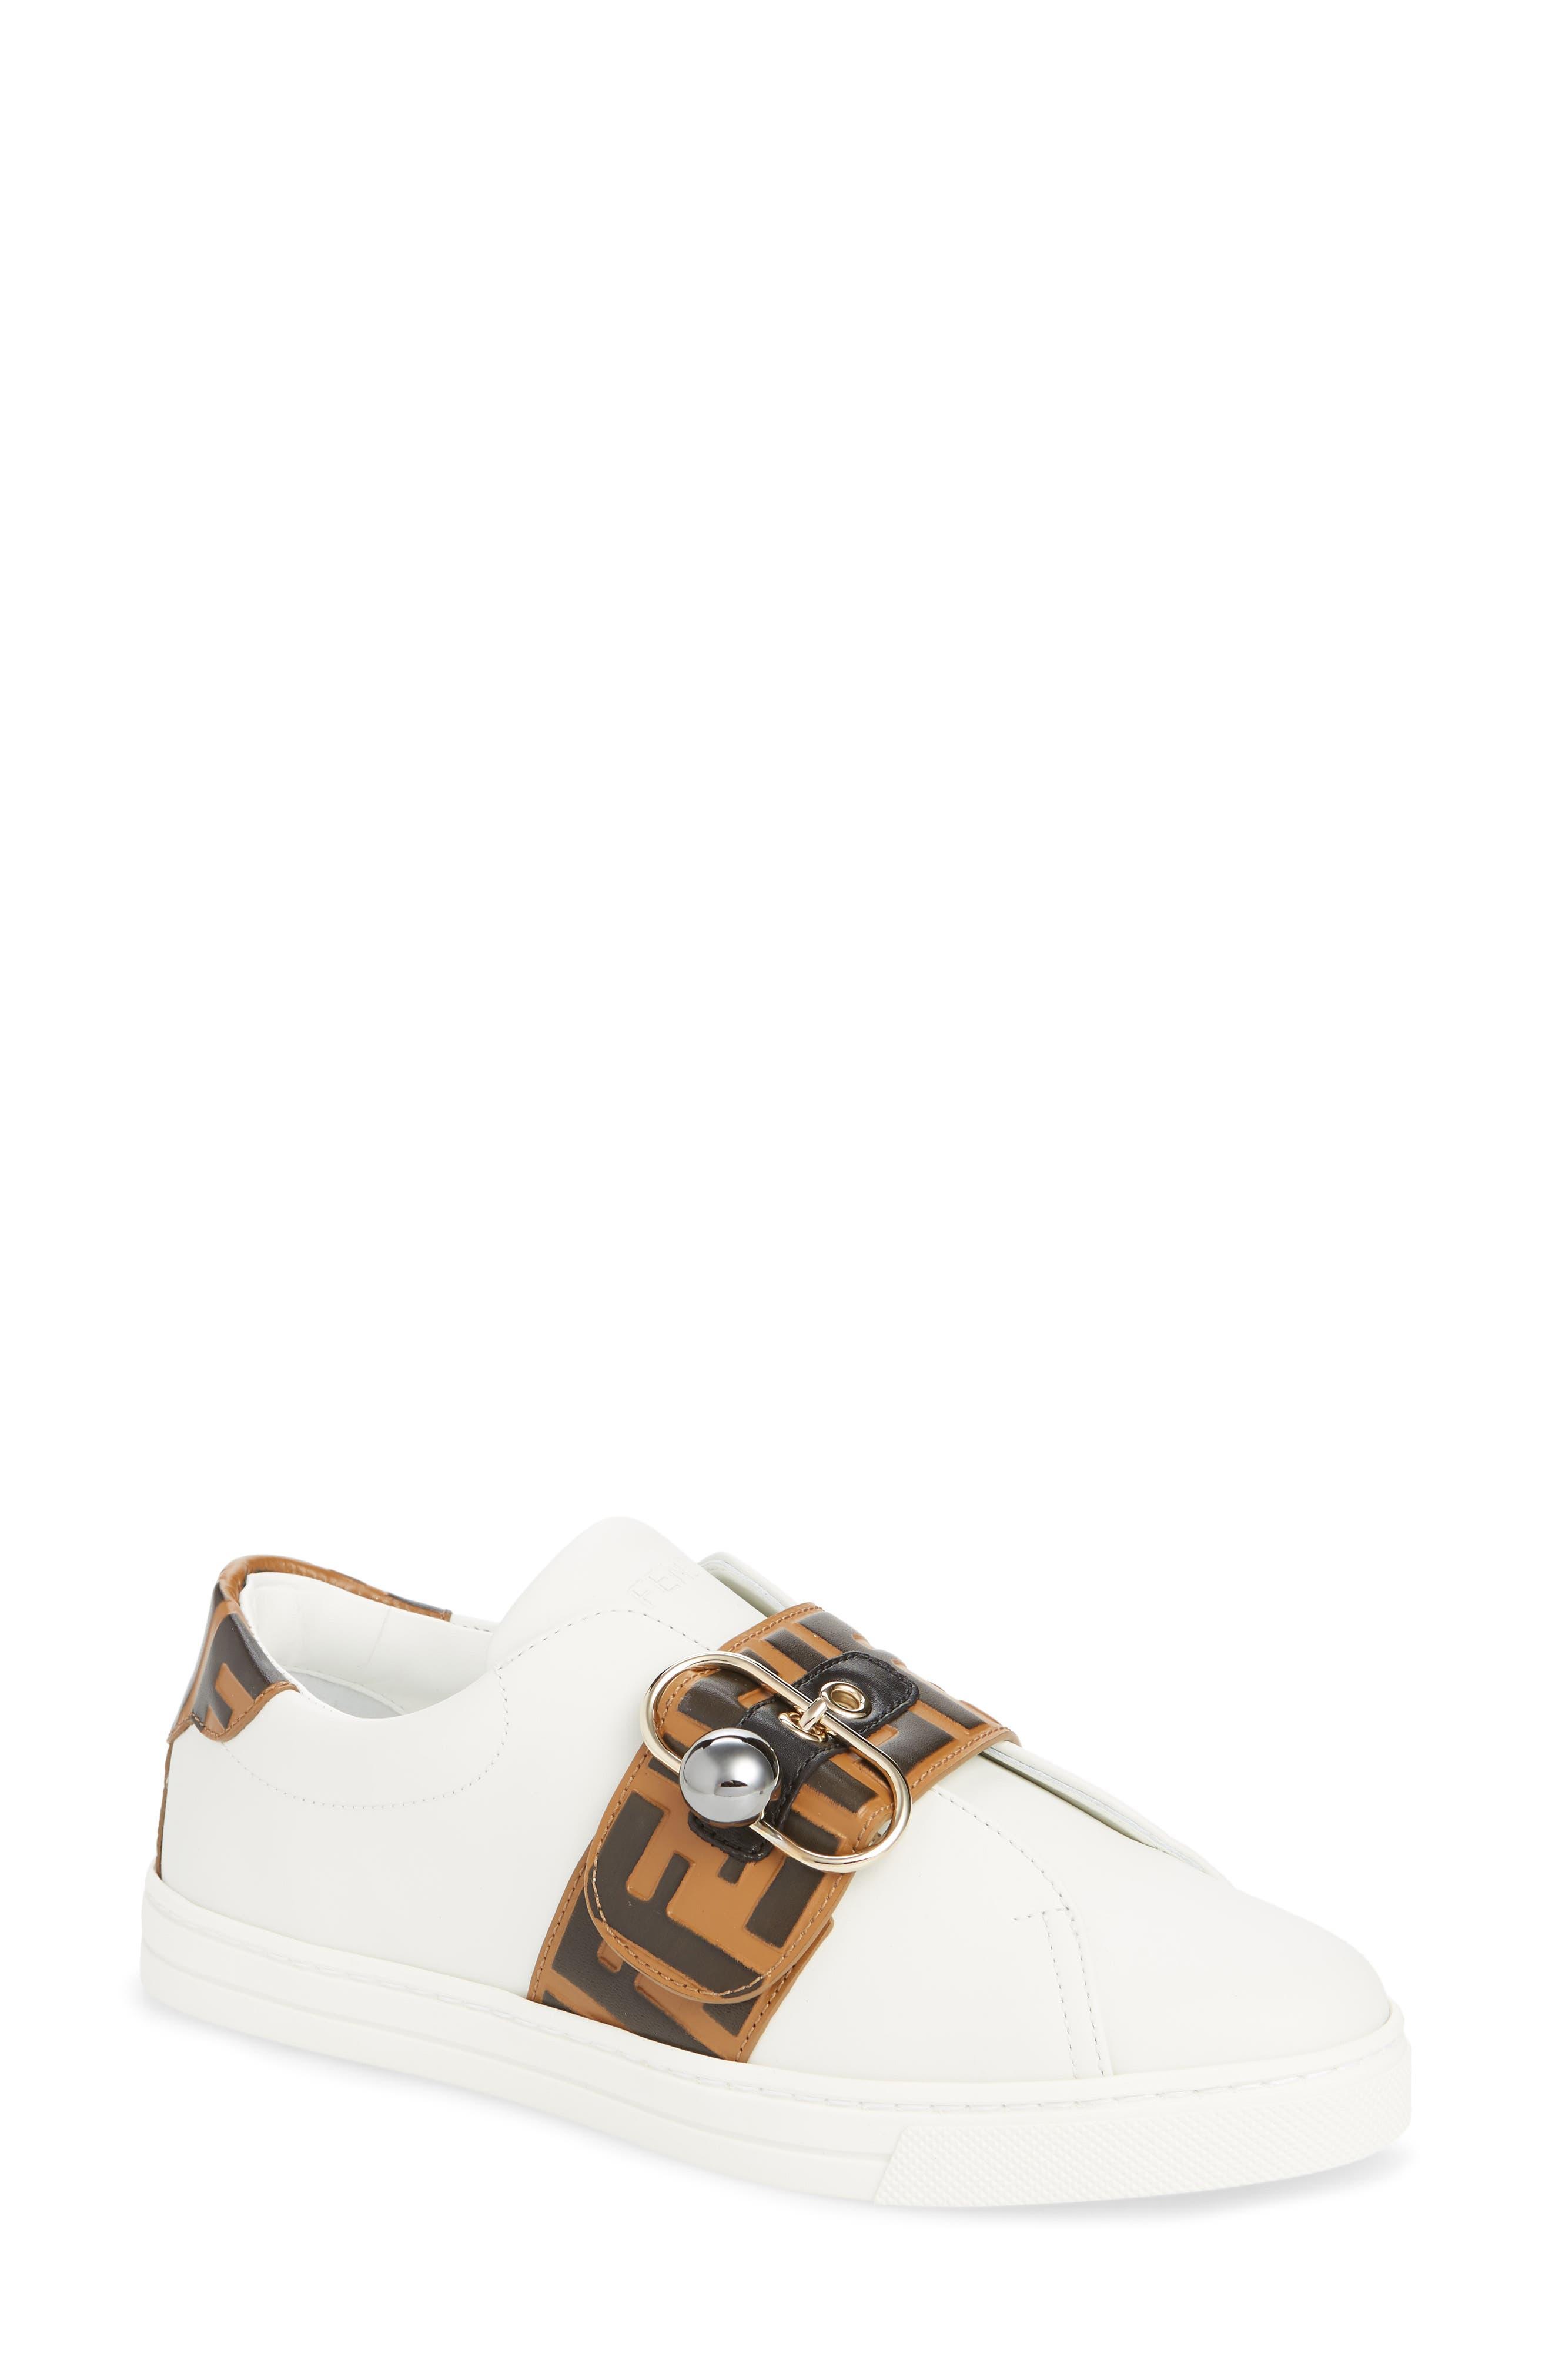 FENDI Pearland Logo Slip-On Sneaker, Main, color, WHITE/ BROWN